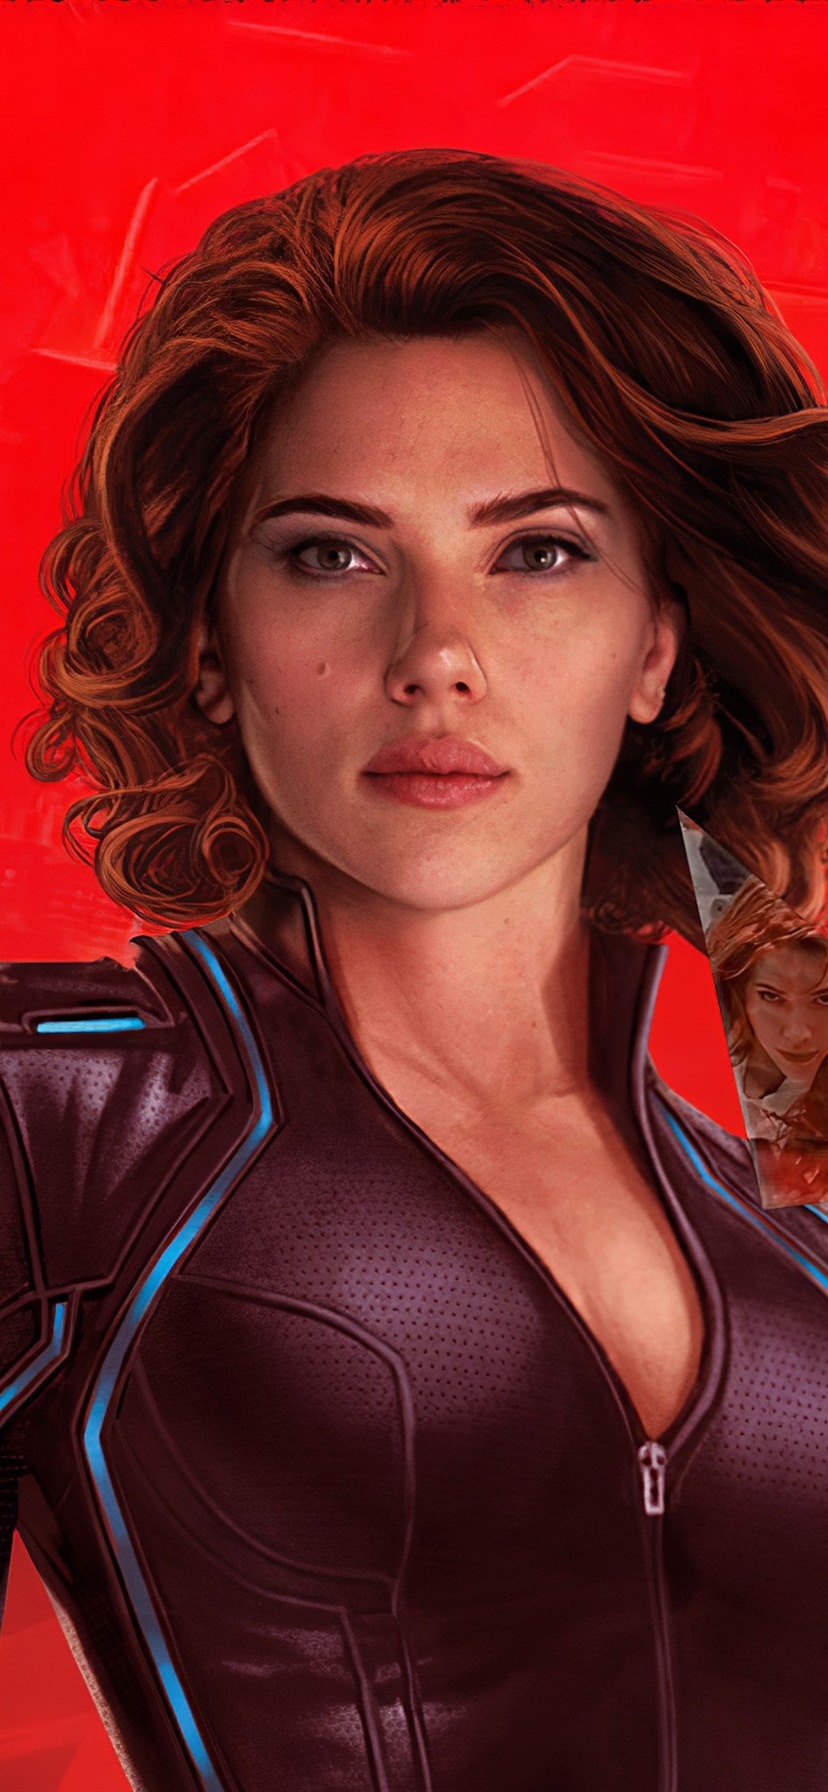 Wallpaper Scarlett Johansson Black Widow 2020 3840x2160 Uhd 4k Picture Image